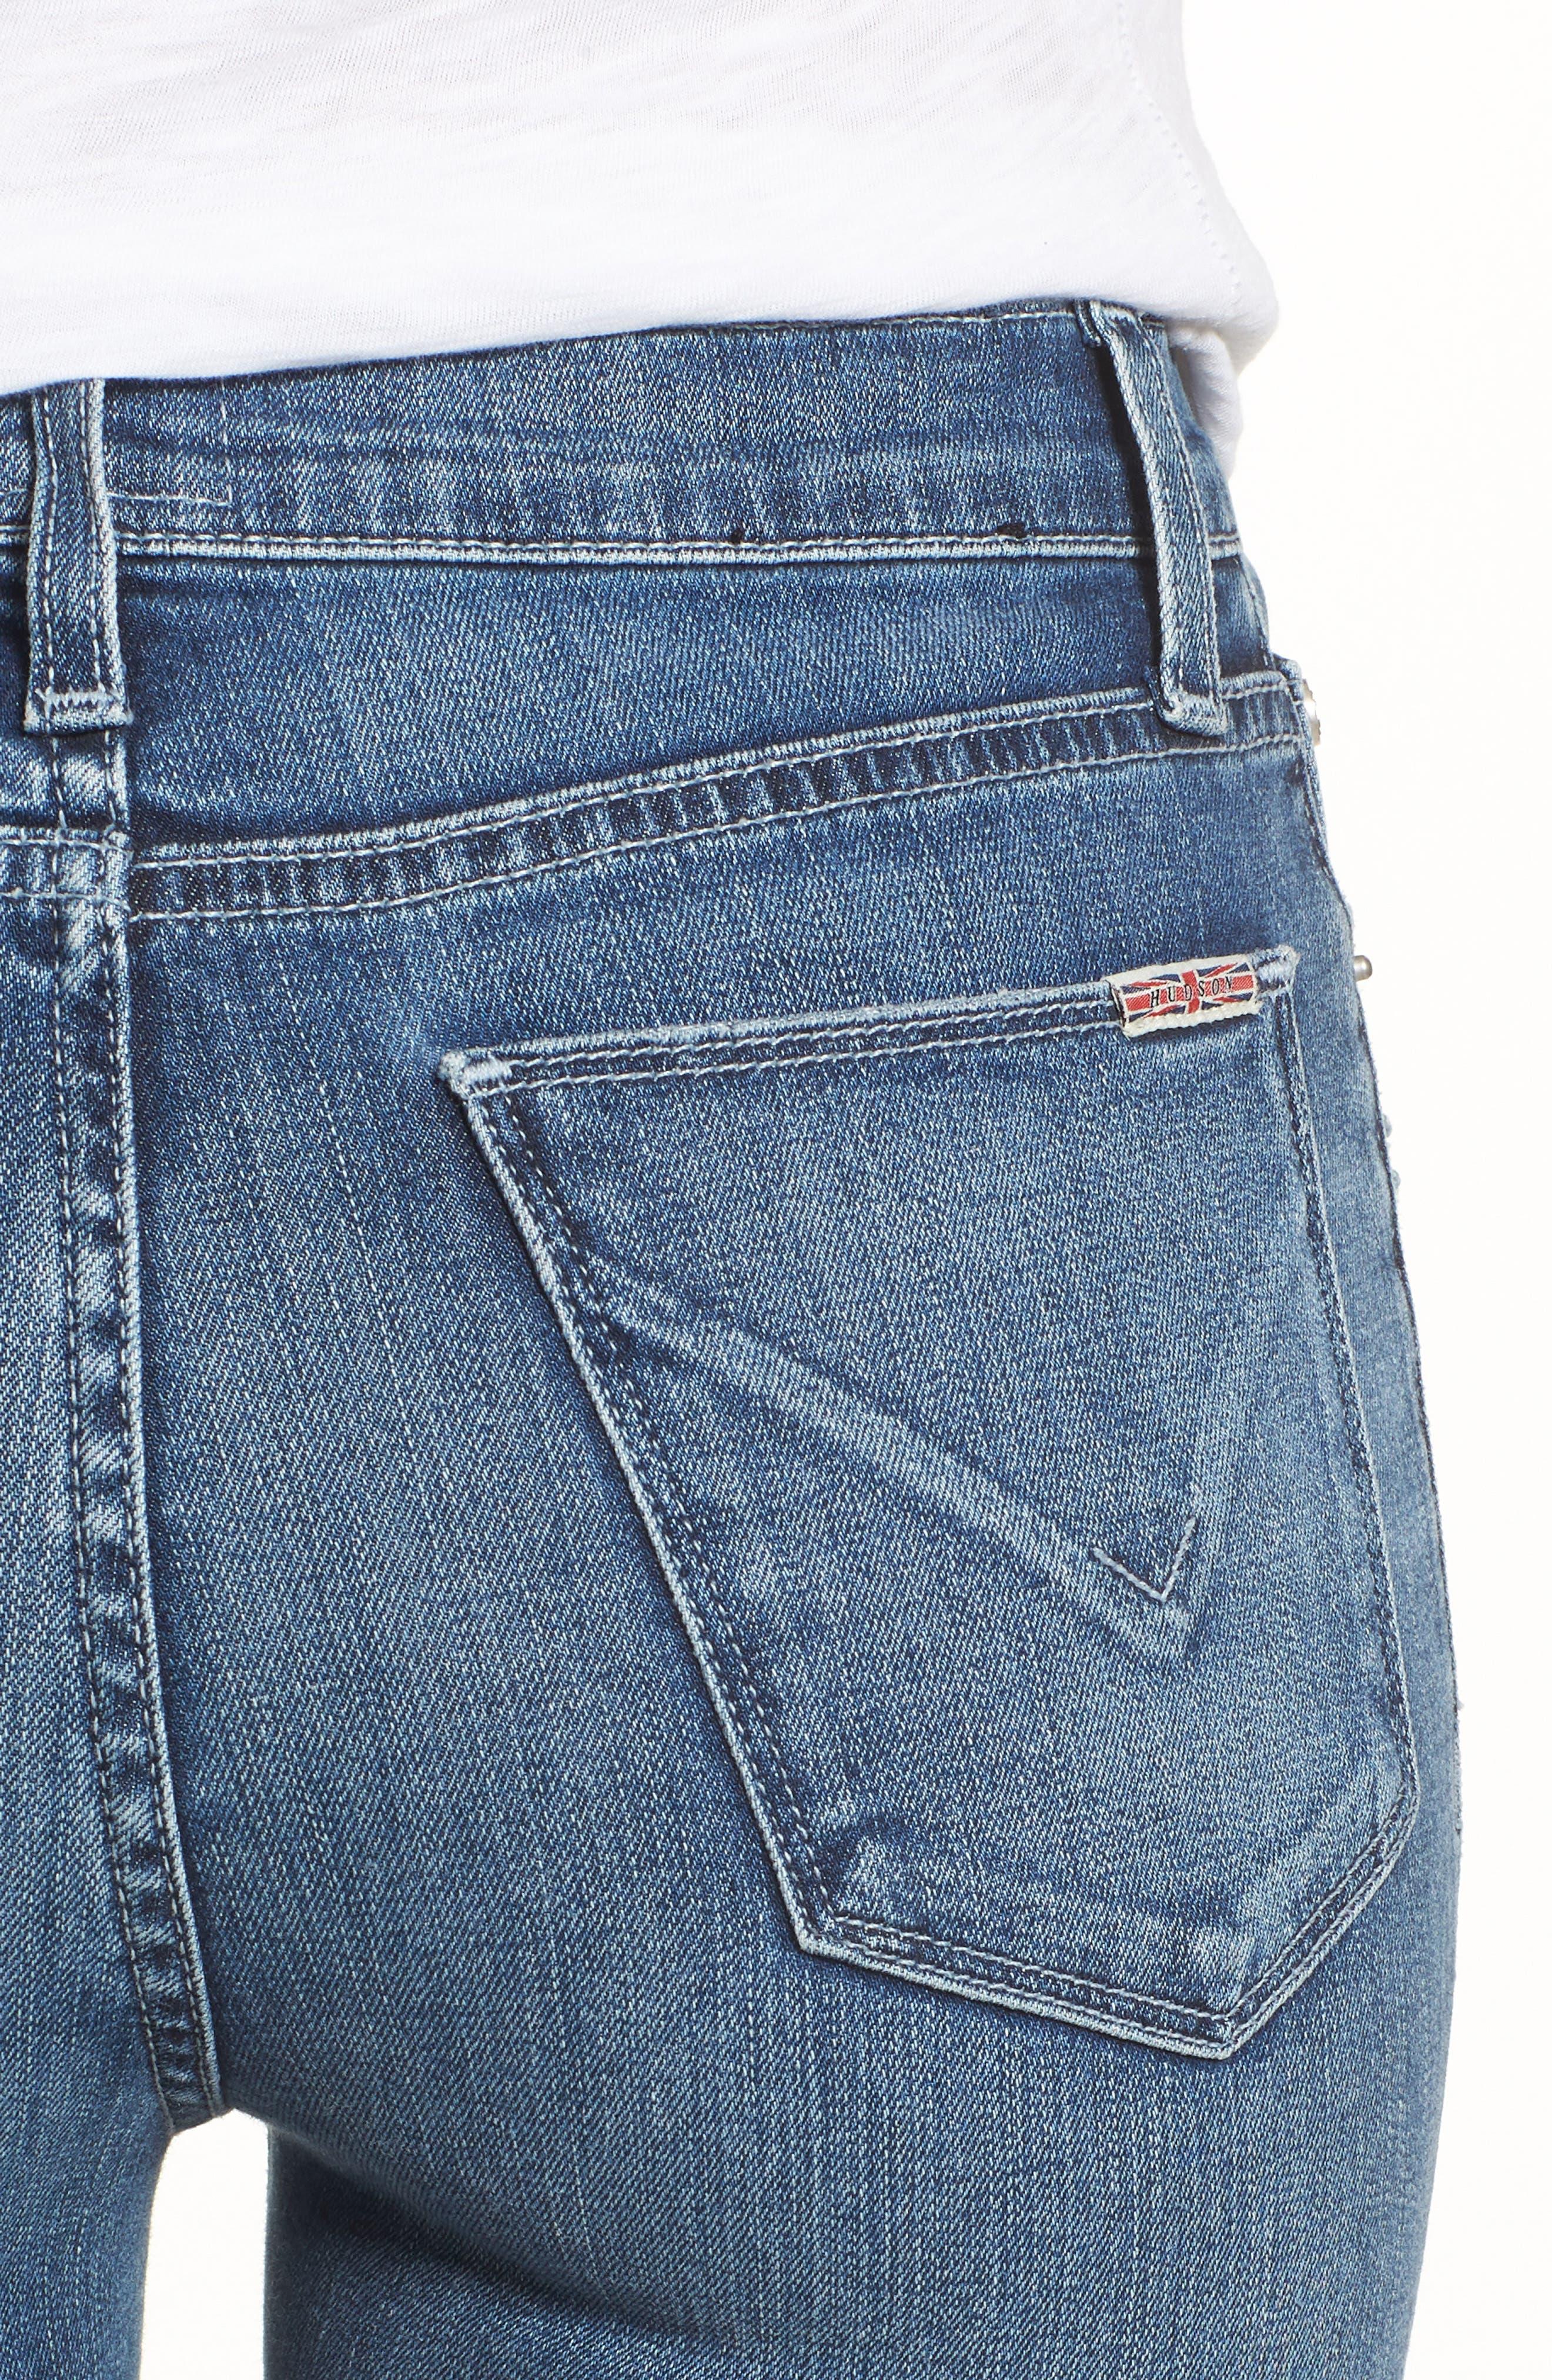 Hudson Barbara High Waist Ankle Skinny Jeans,                             Alternate thumbnail 4, color,                             Contender